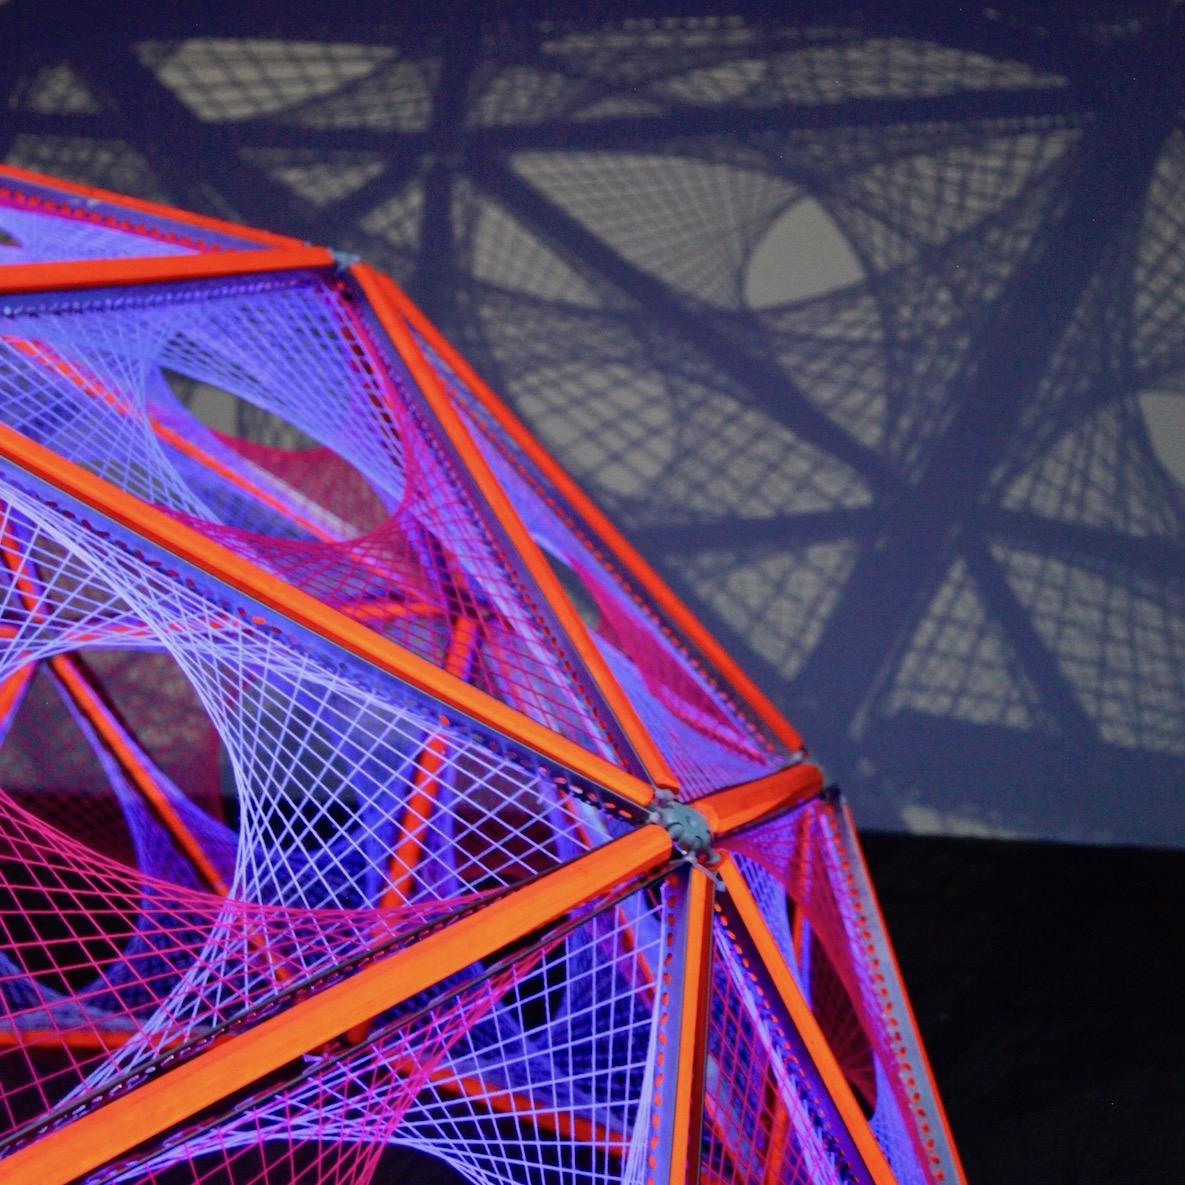 2-dome-parabola-hubs-yarn-string-ultra-violet-uv-black-spectra.jpg